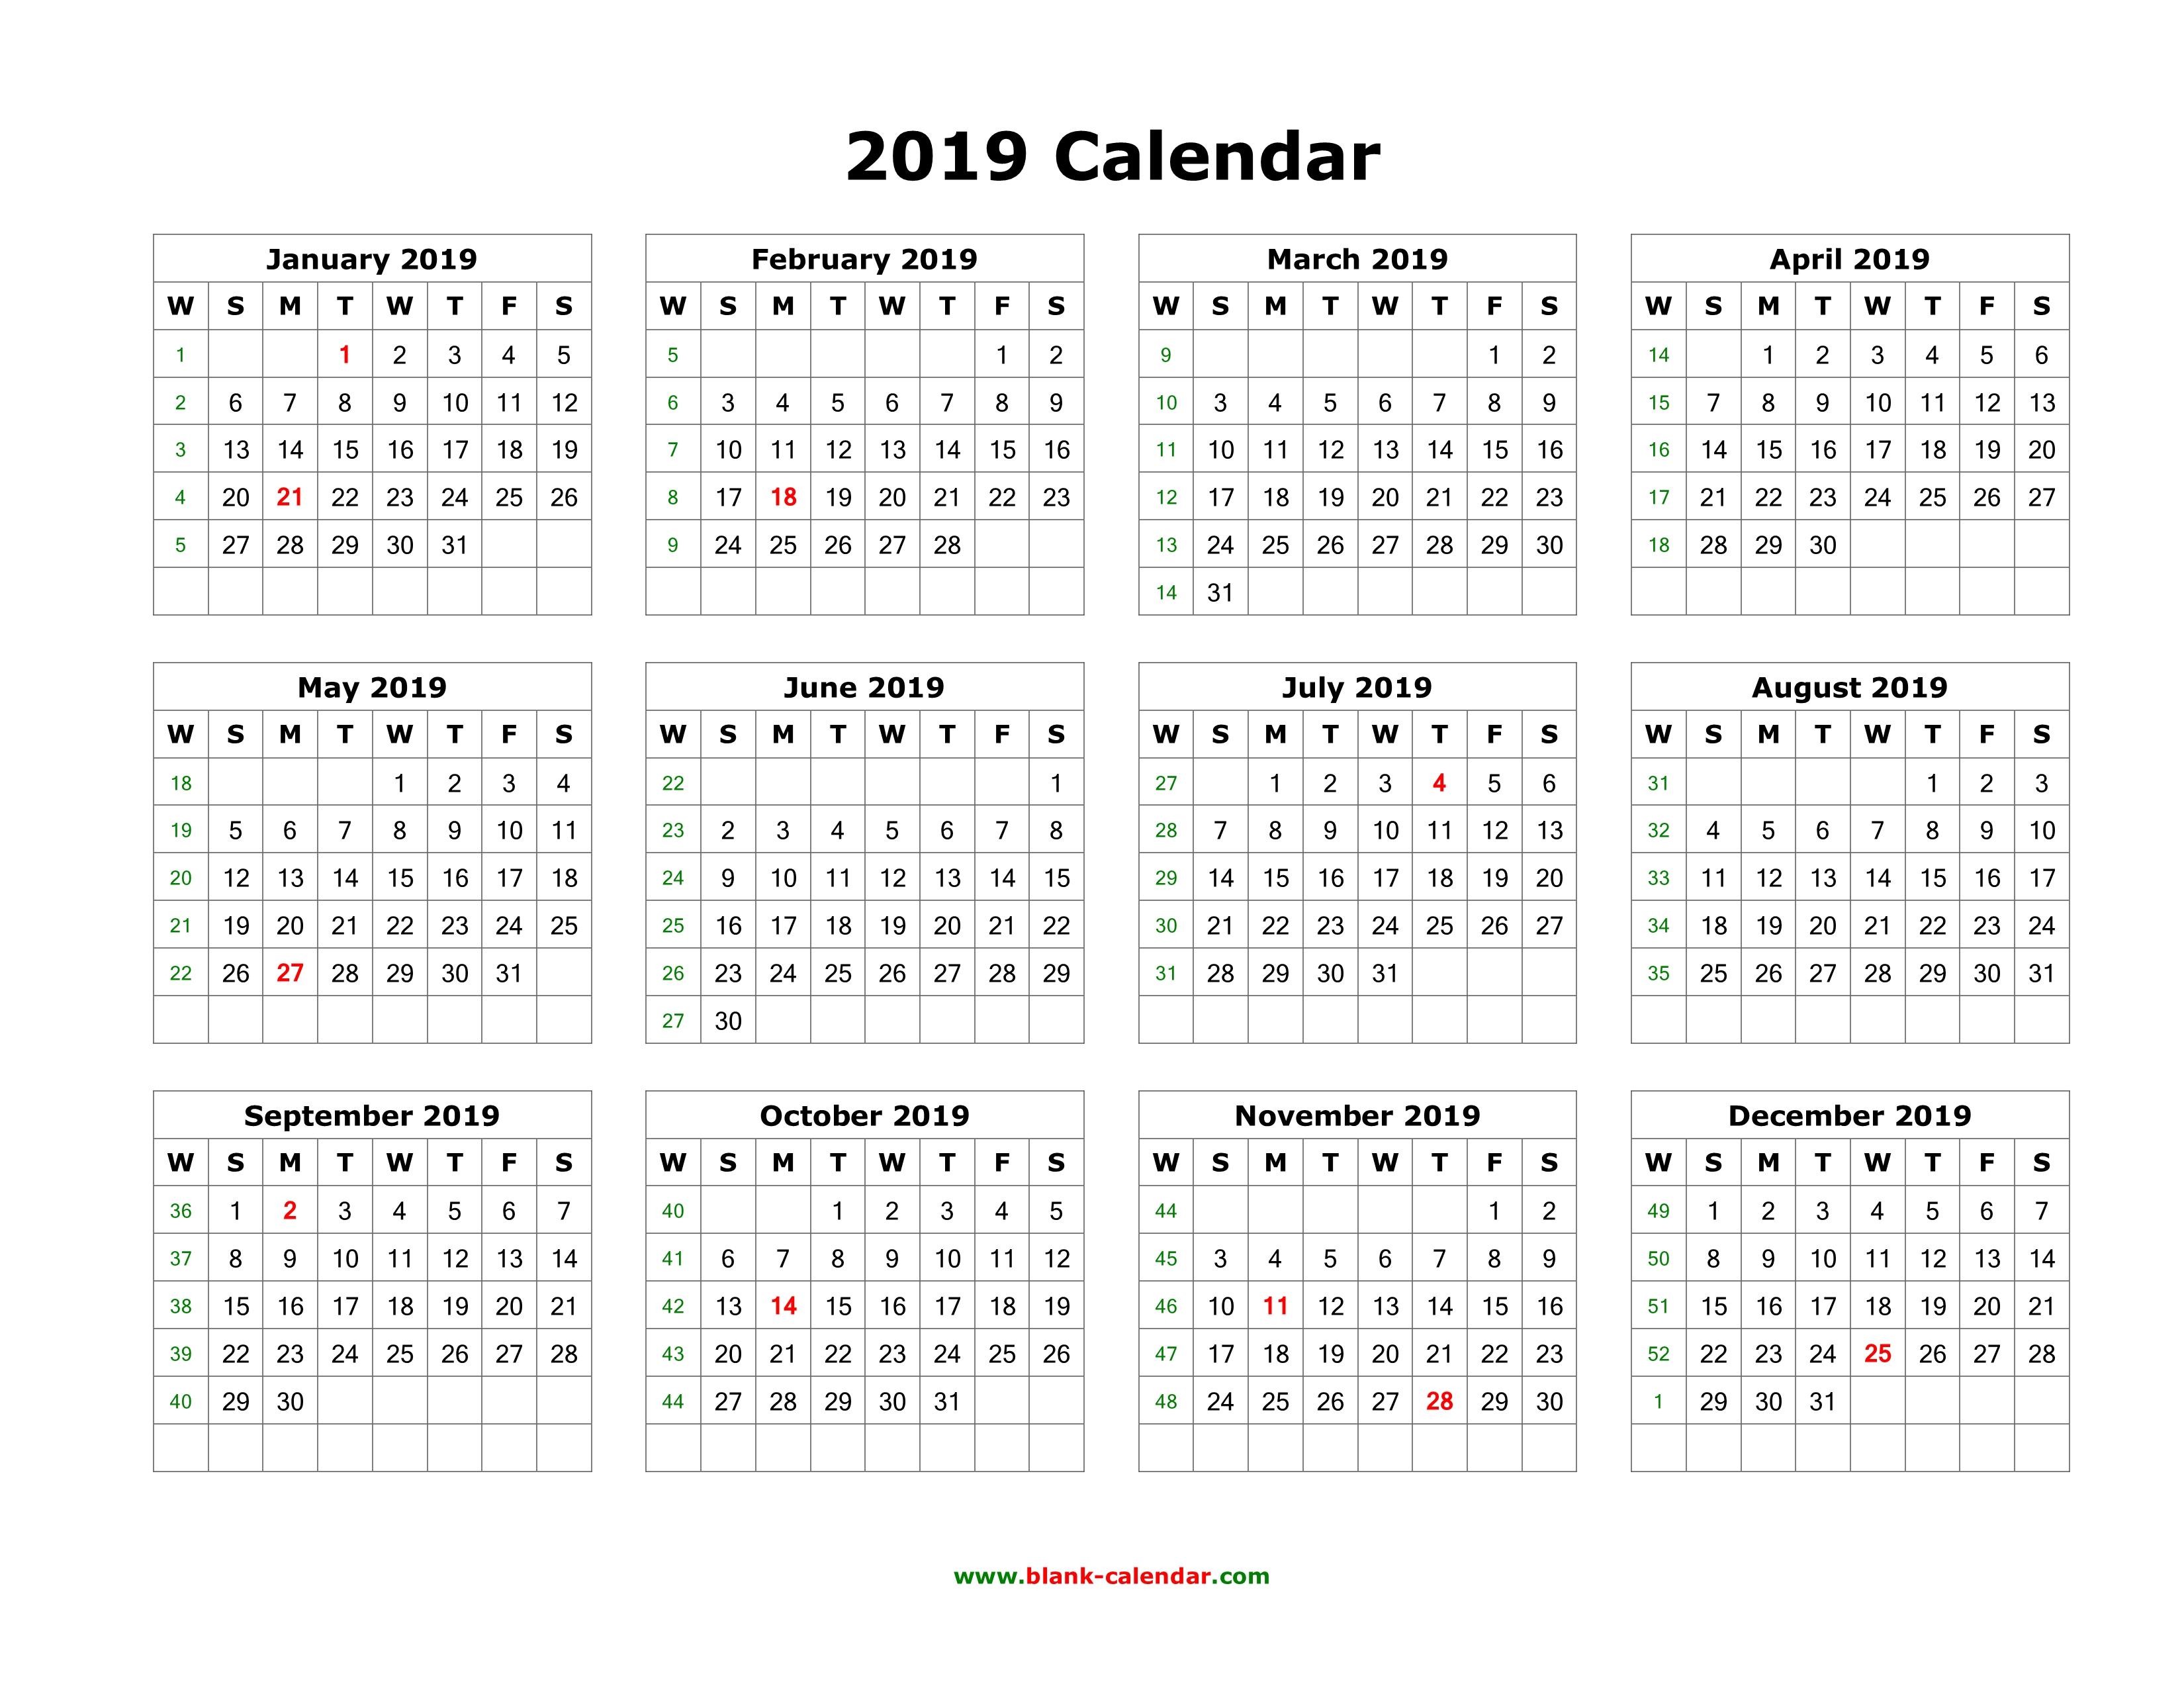 Free Printable Calendar 2019 | Blank Calendar, Monthly And Yearly regarding Edit Free Calendar Template 2019-2020